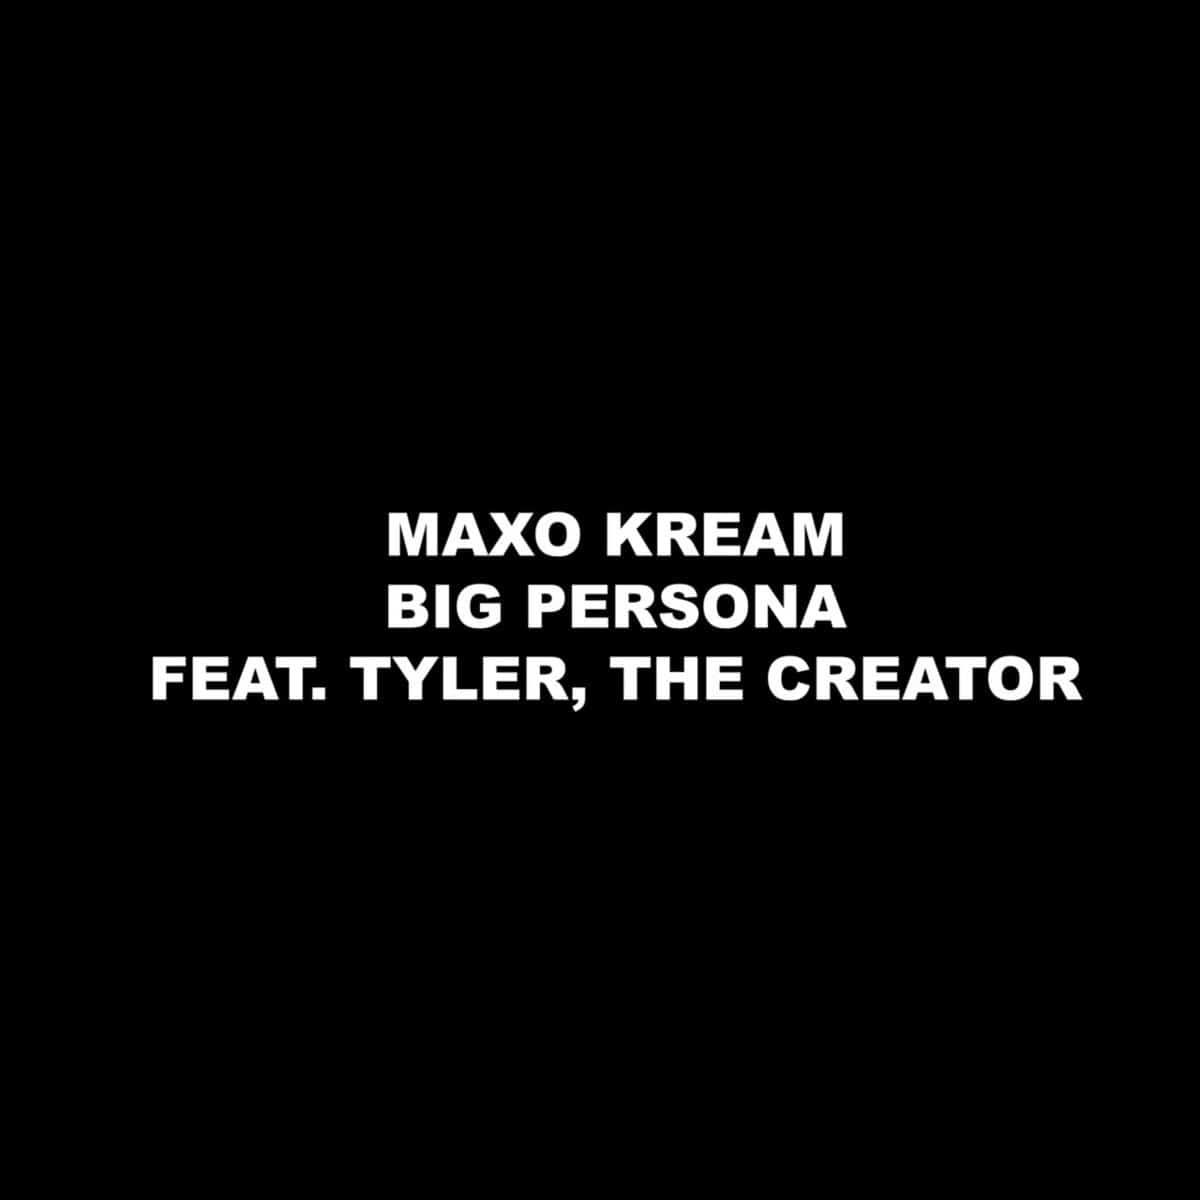 Maxo Kream Ft. Tyler, The Creator - Big Persona